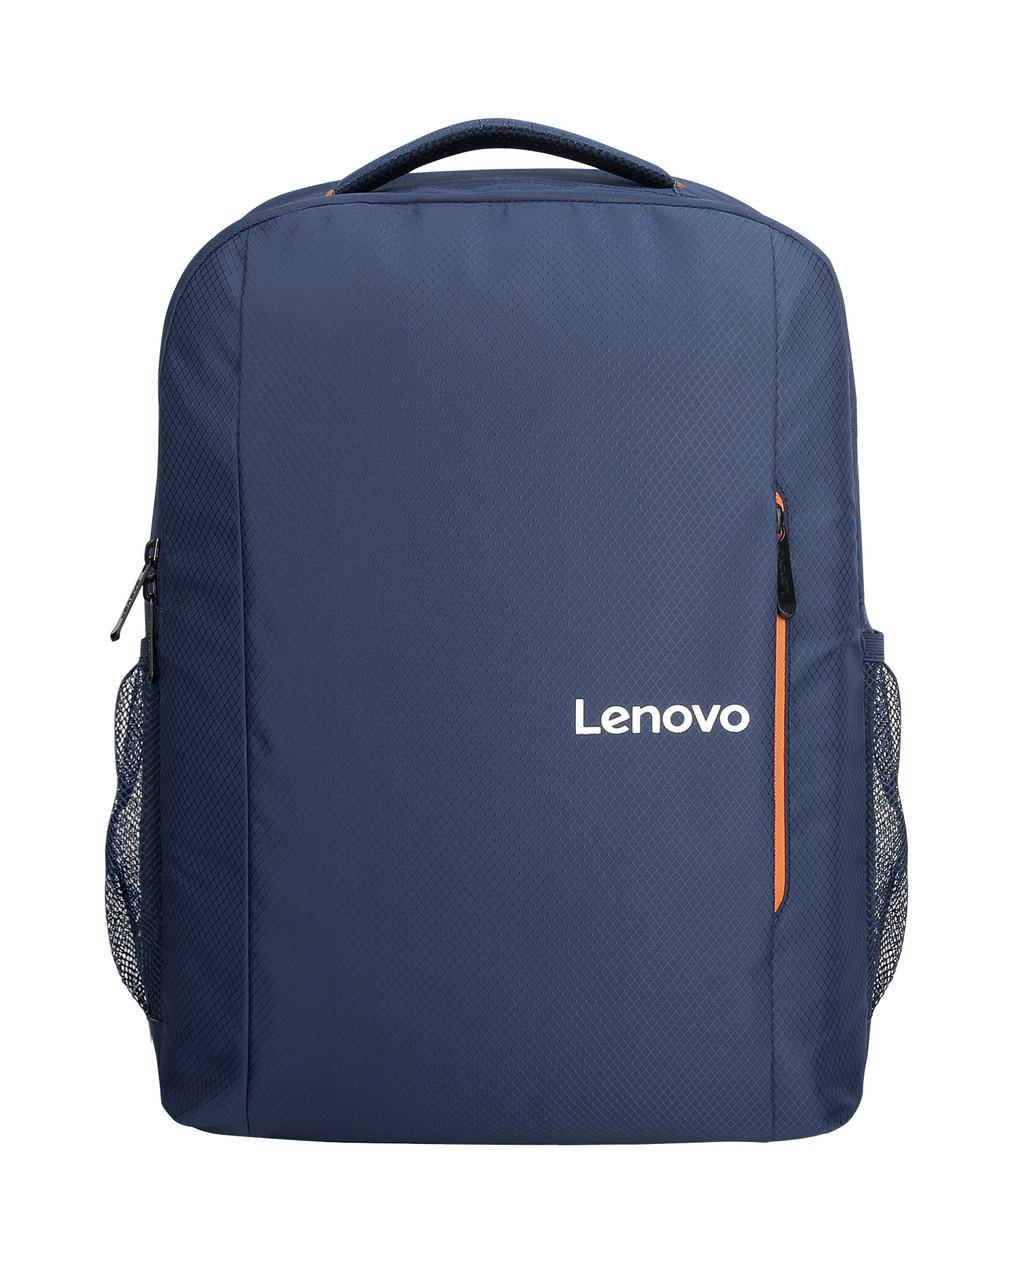 "Lenovo GX40Q75216 Рюкзак для ноутбука 15,6"", B515 Laptop Everyday Backpack цвет голубой"